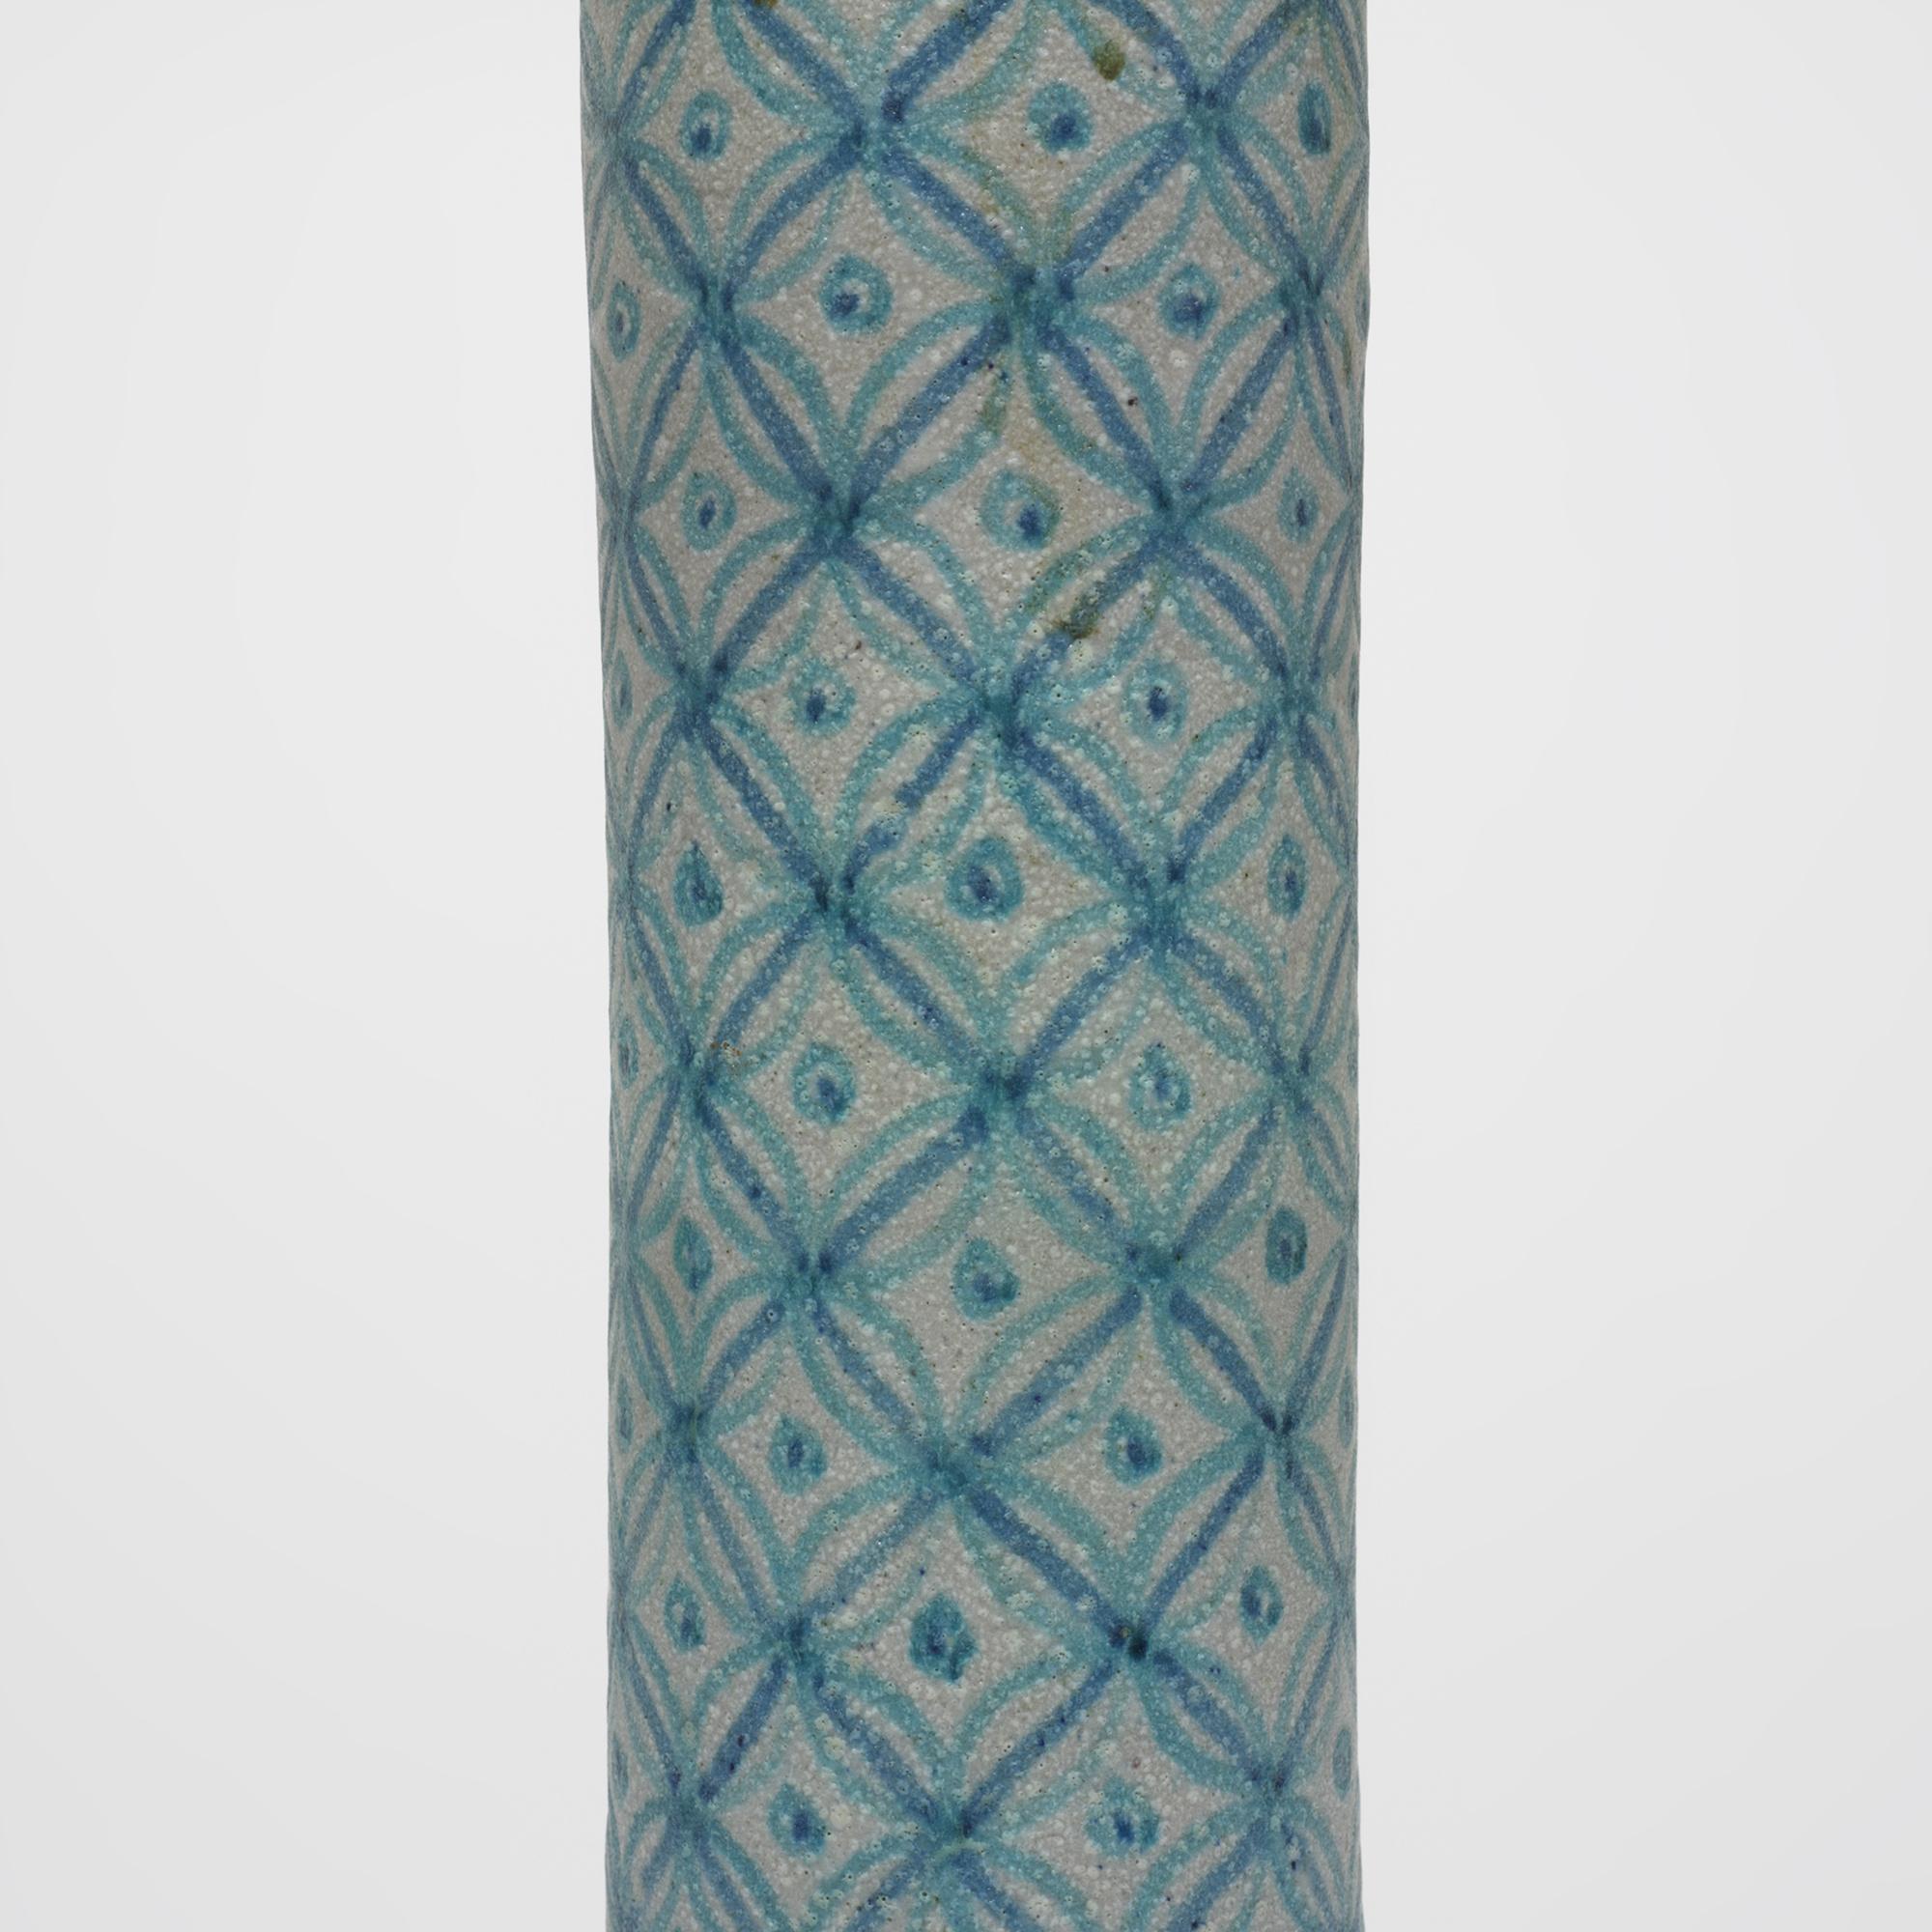 Modern Home Design October 2012: 375: GUIDO GAMBONE, Vase